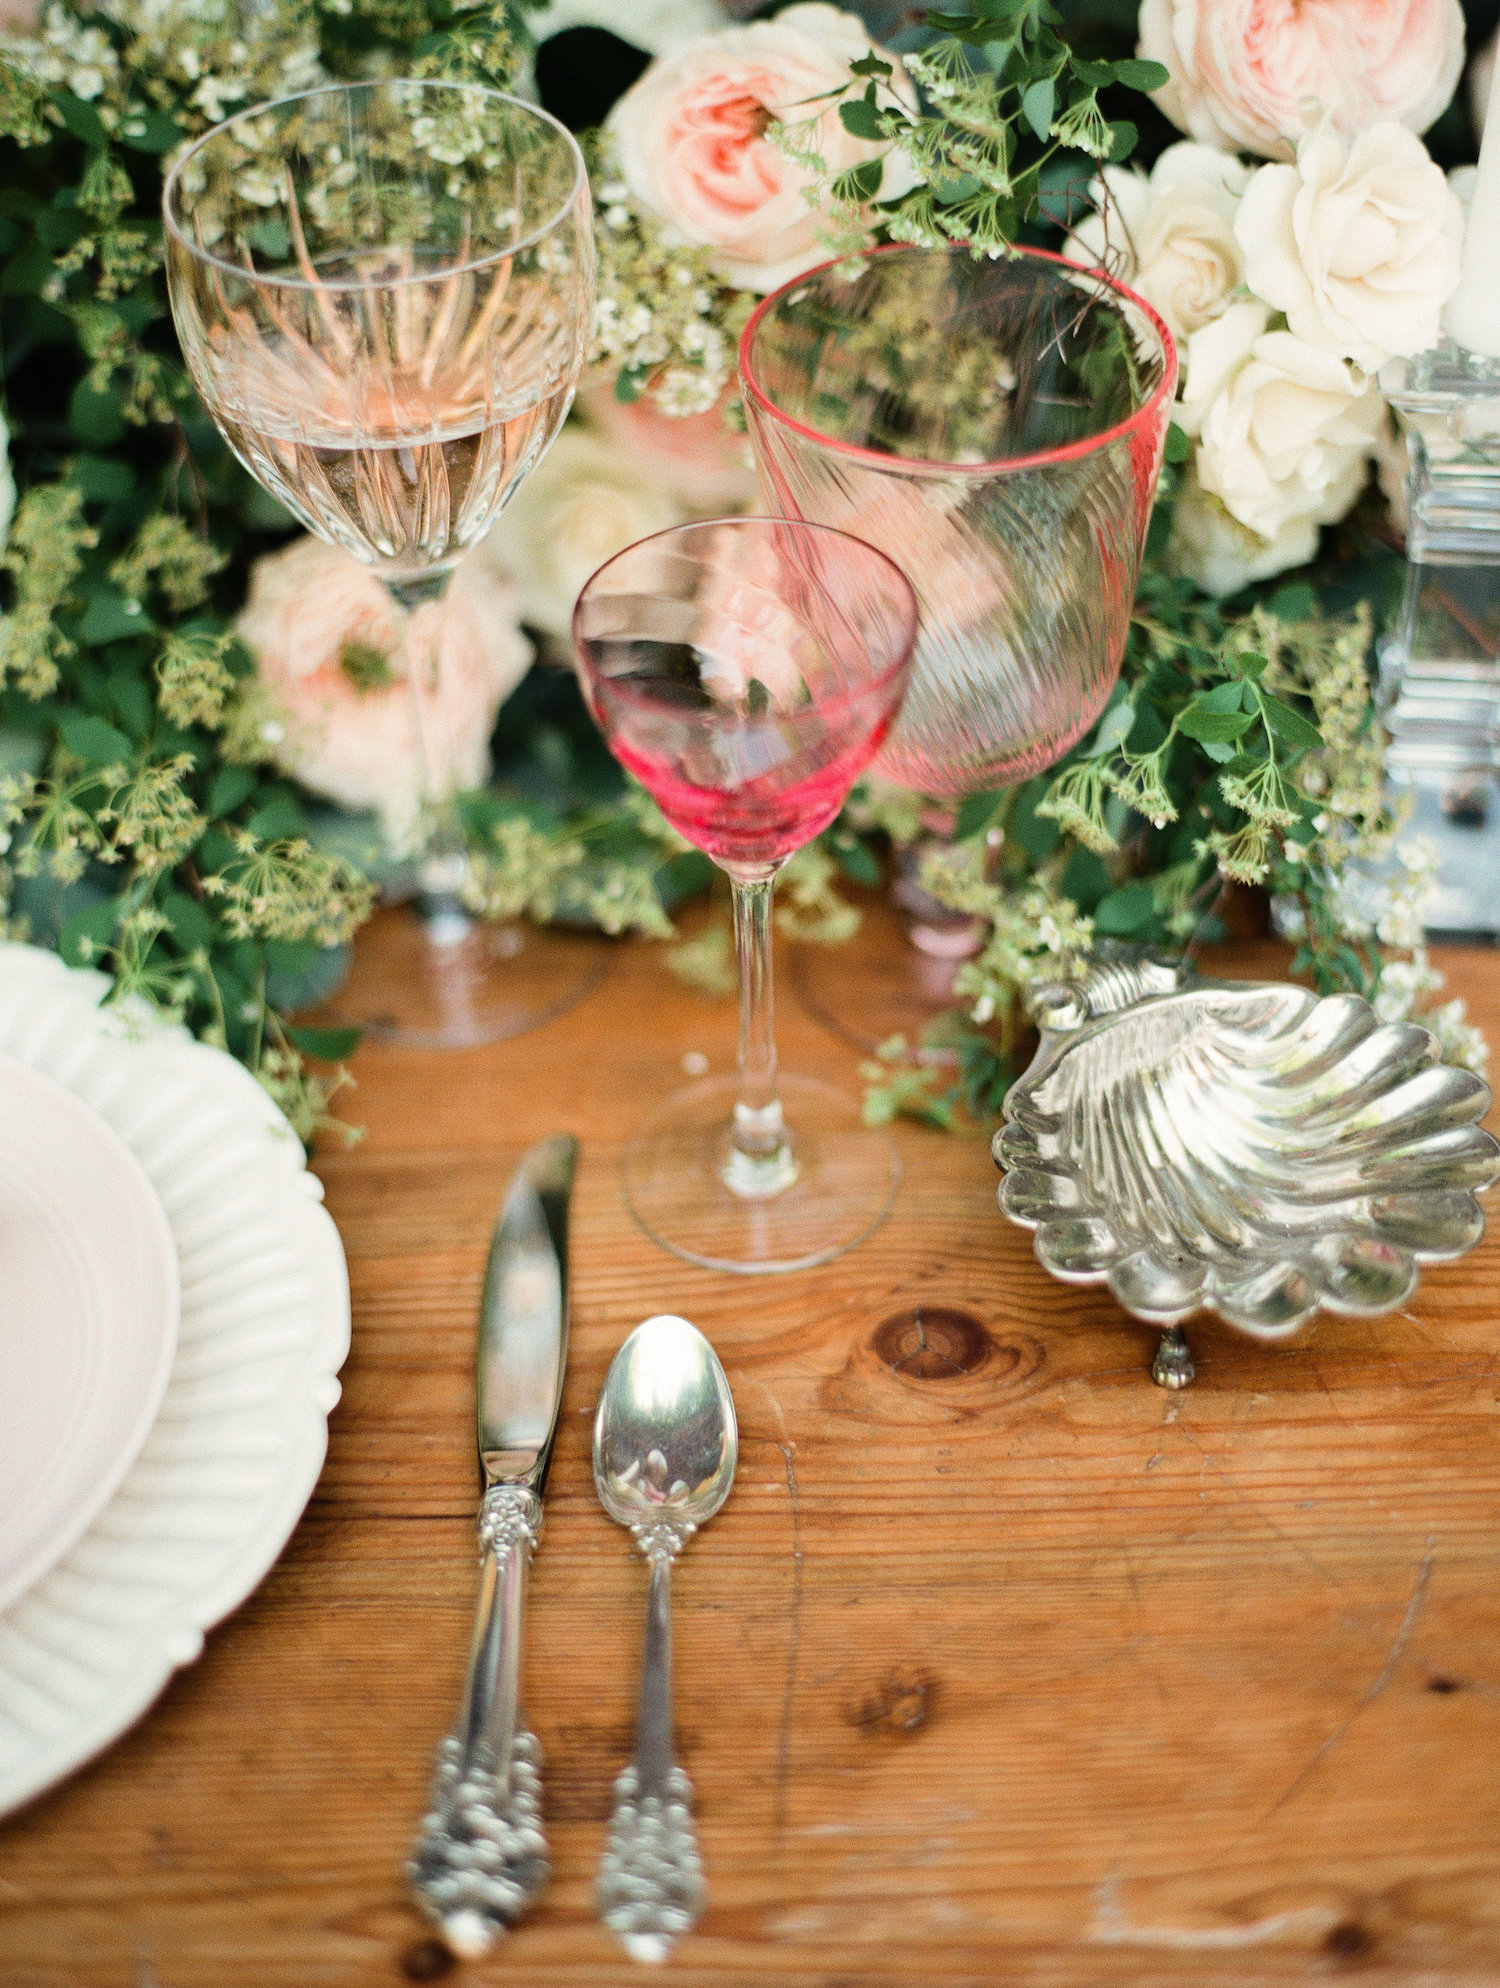 Morning Glow - Full Aperture Floral & Lindsay Madden Photography 81.jpeg